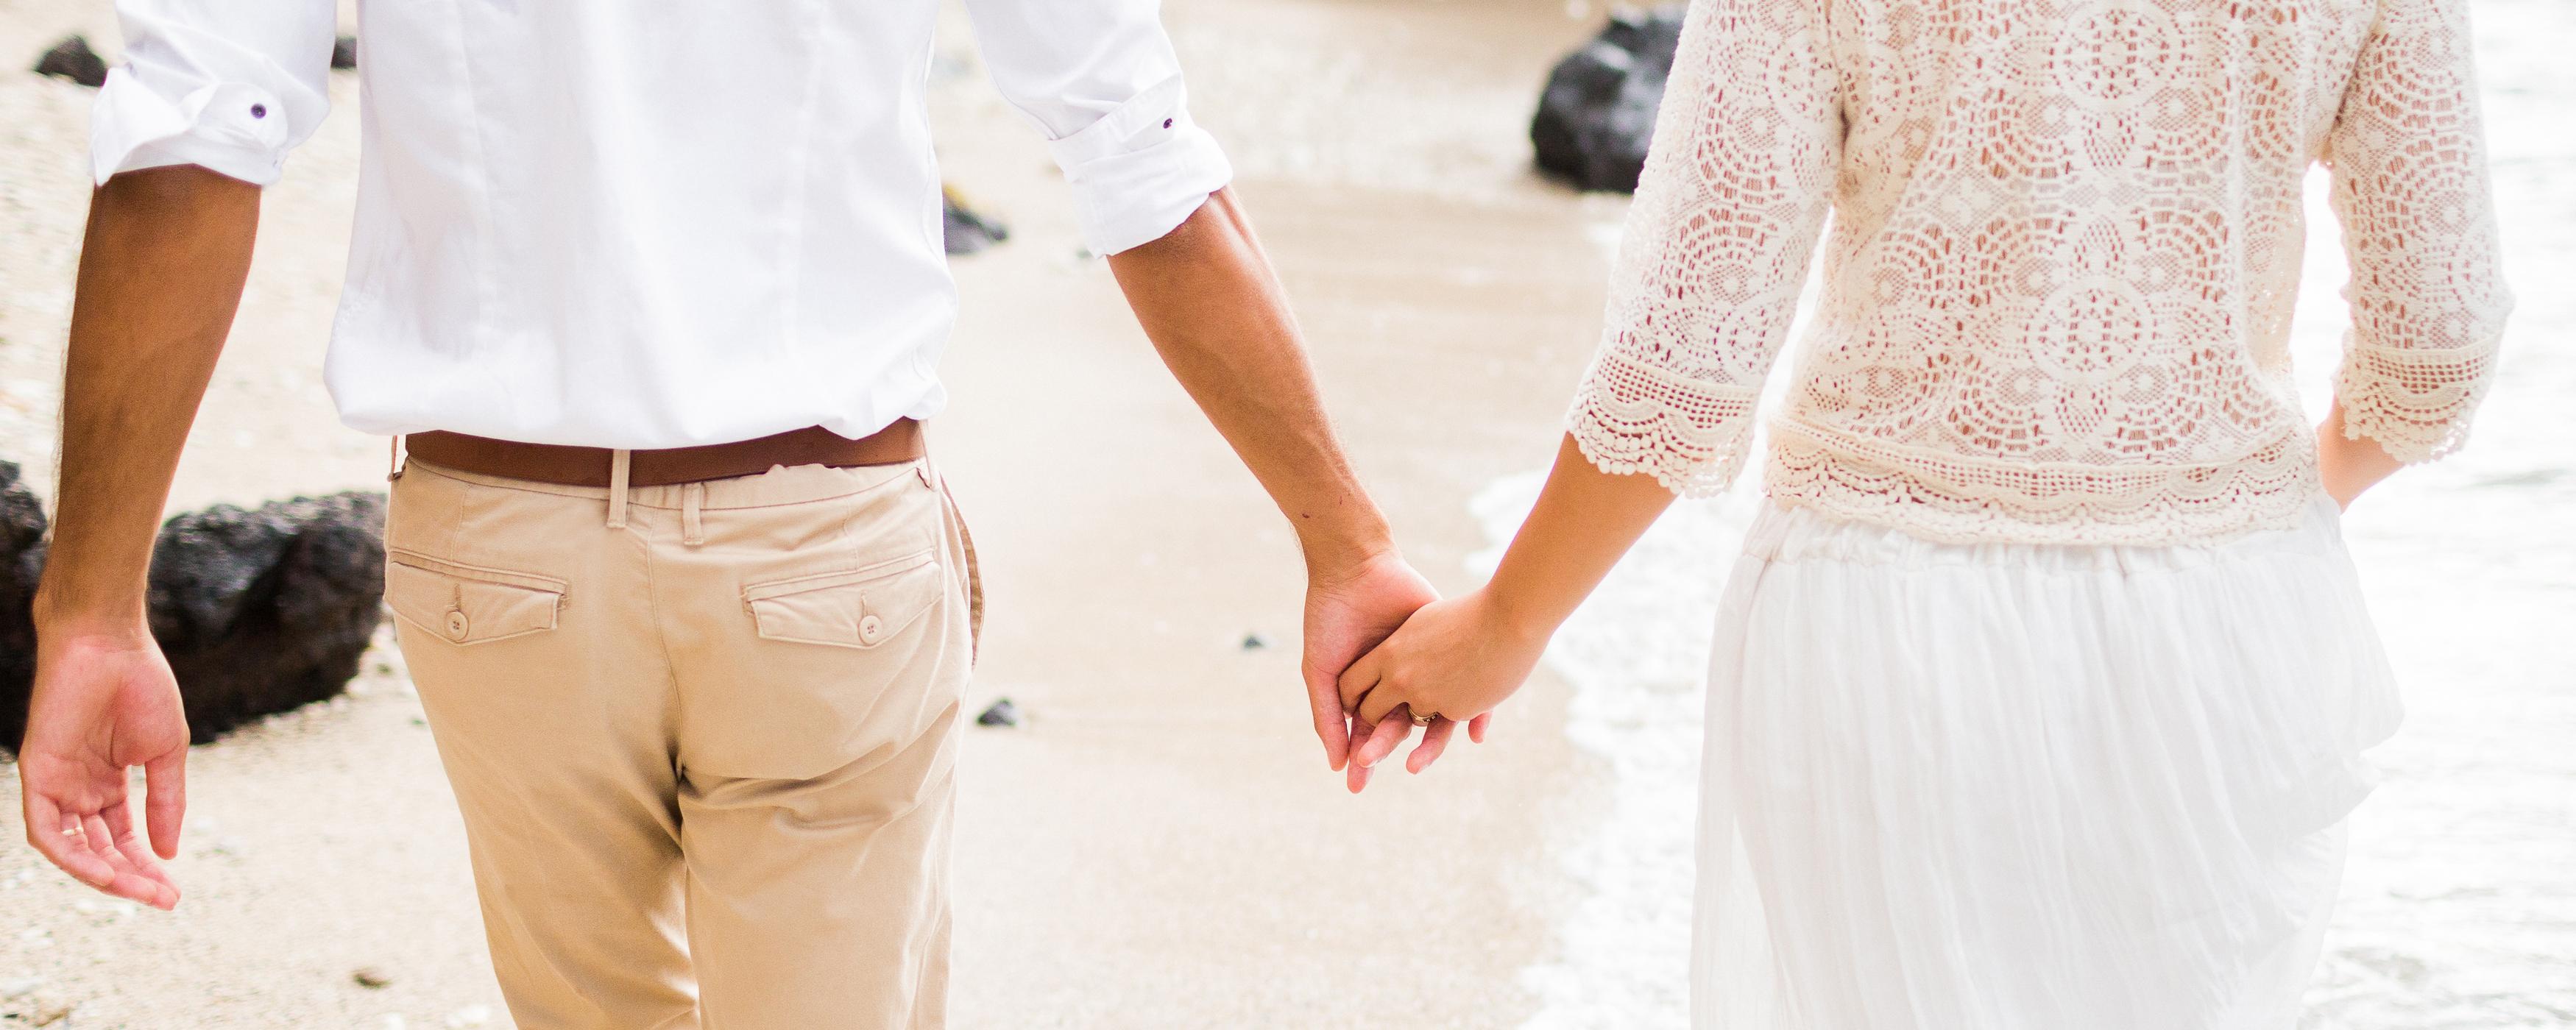 TiaraPhotographie-photographe-mariage-provence-reunion